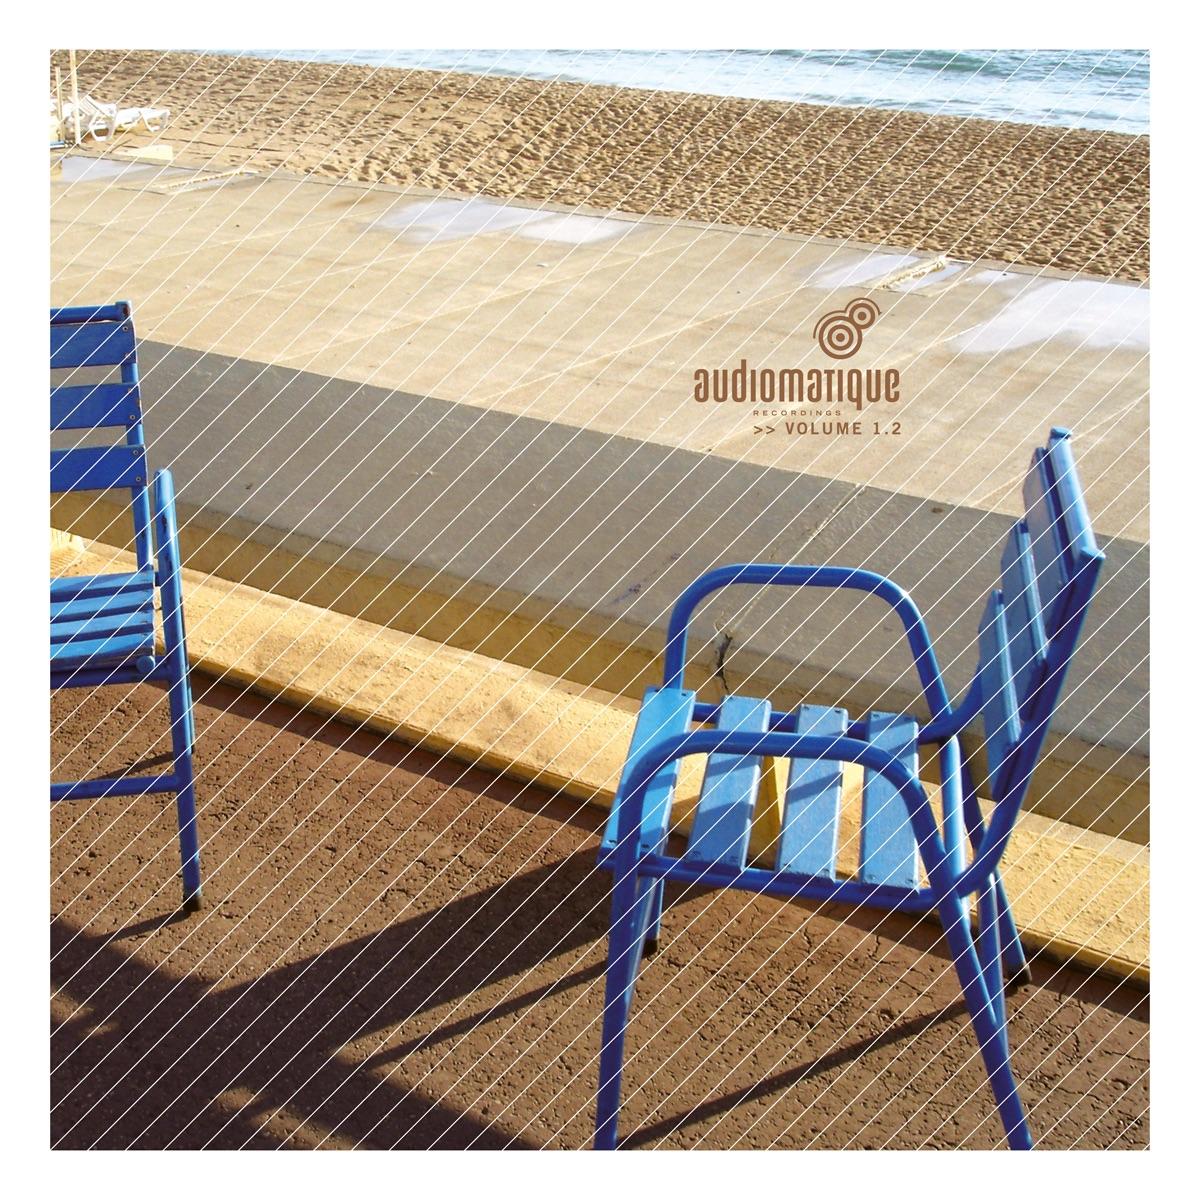 Audiomatique Volume 1 2 Album Cover By Various Artists